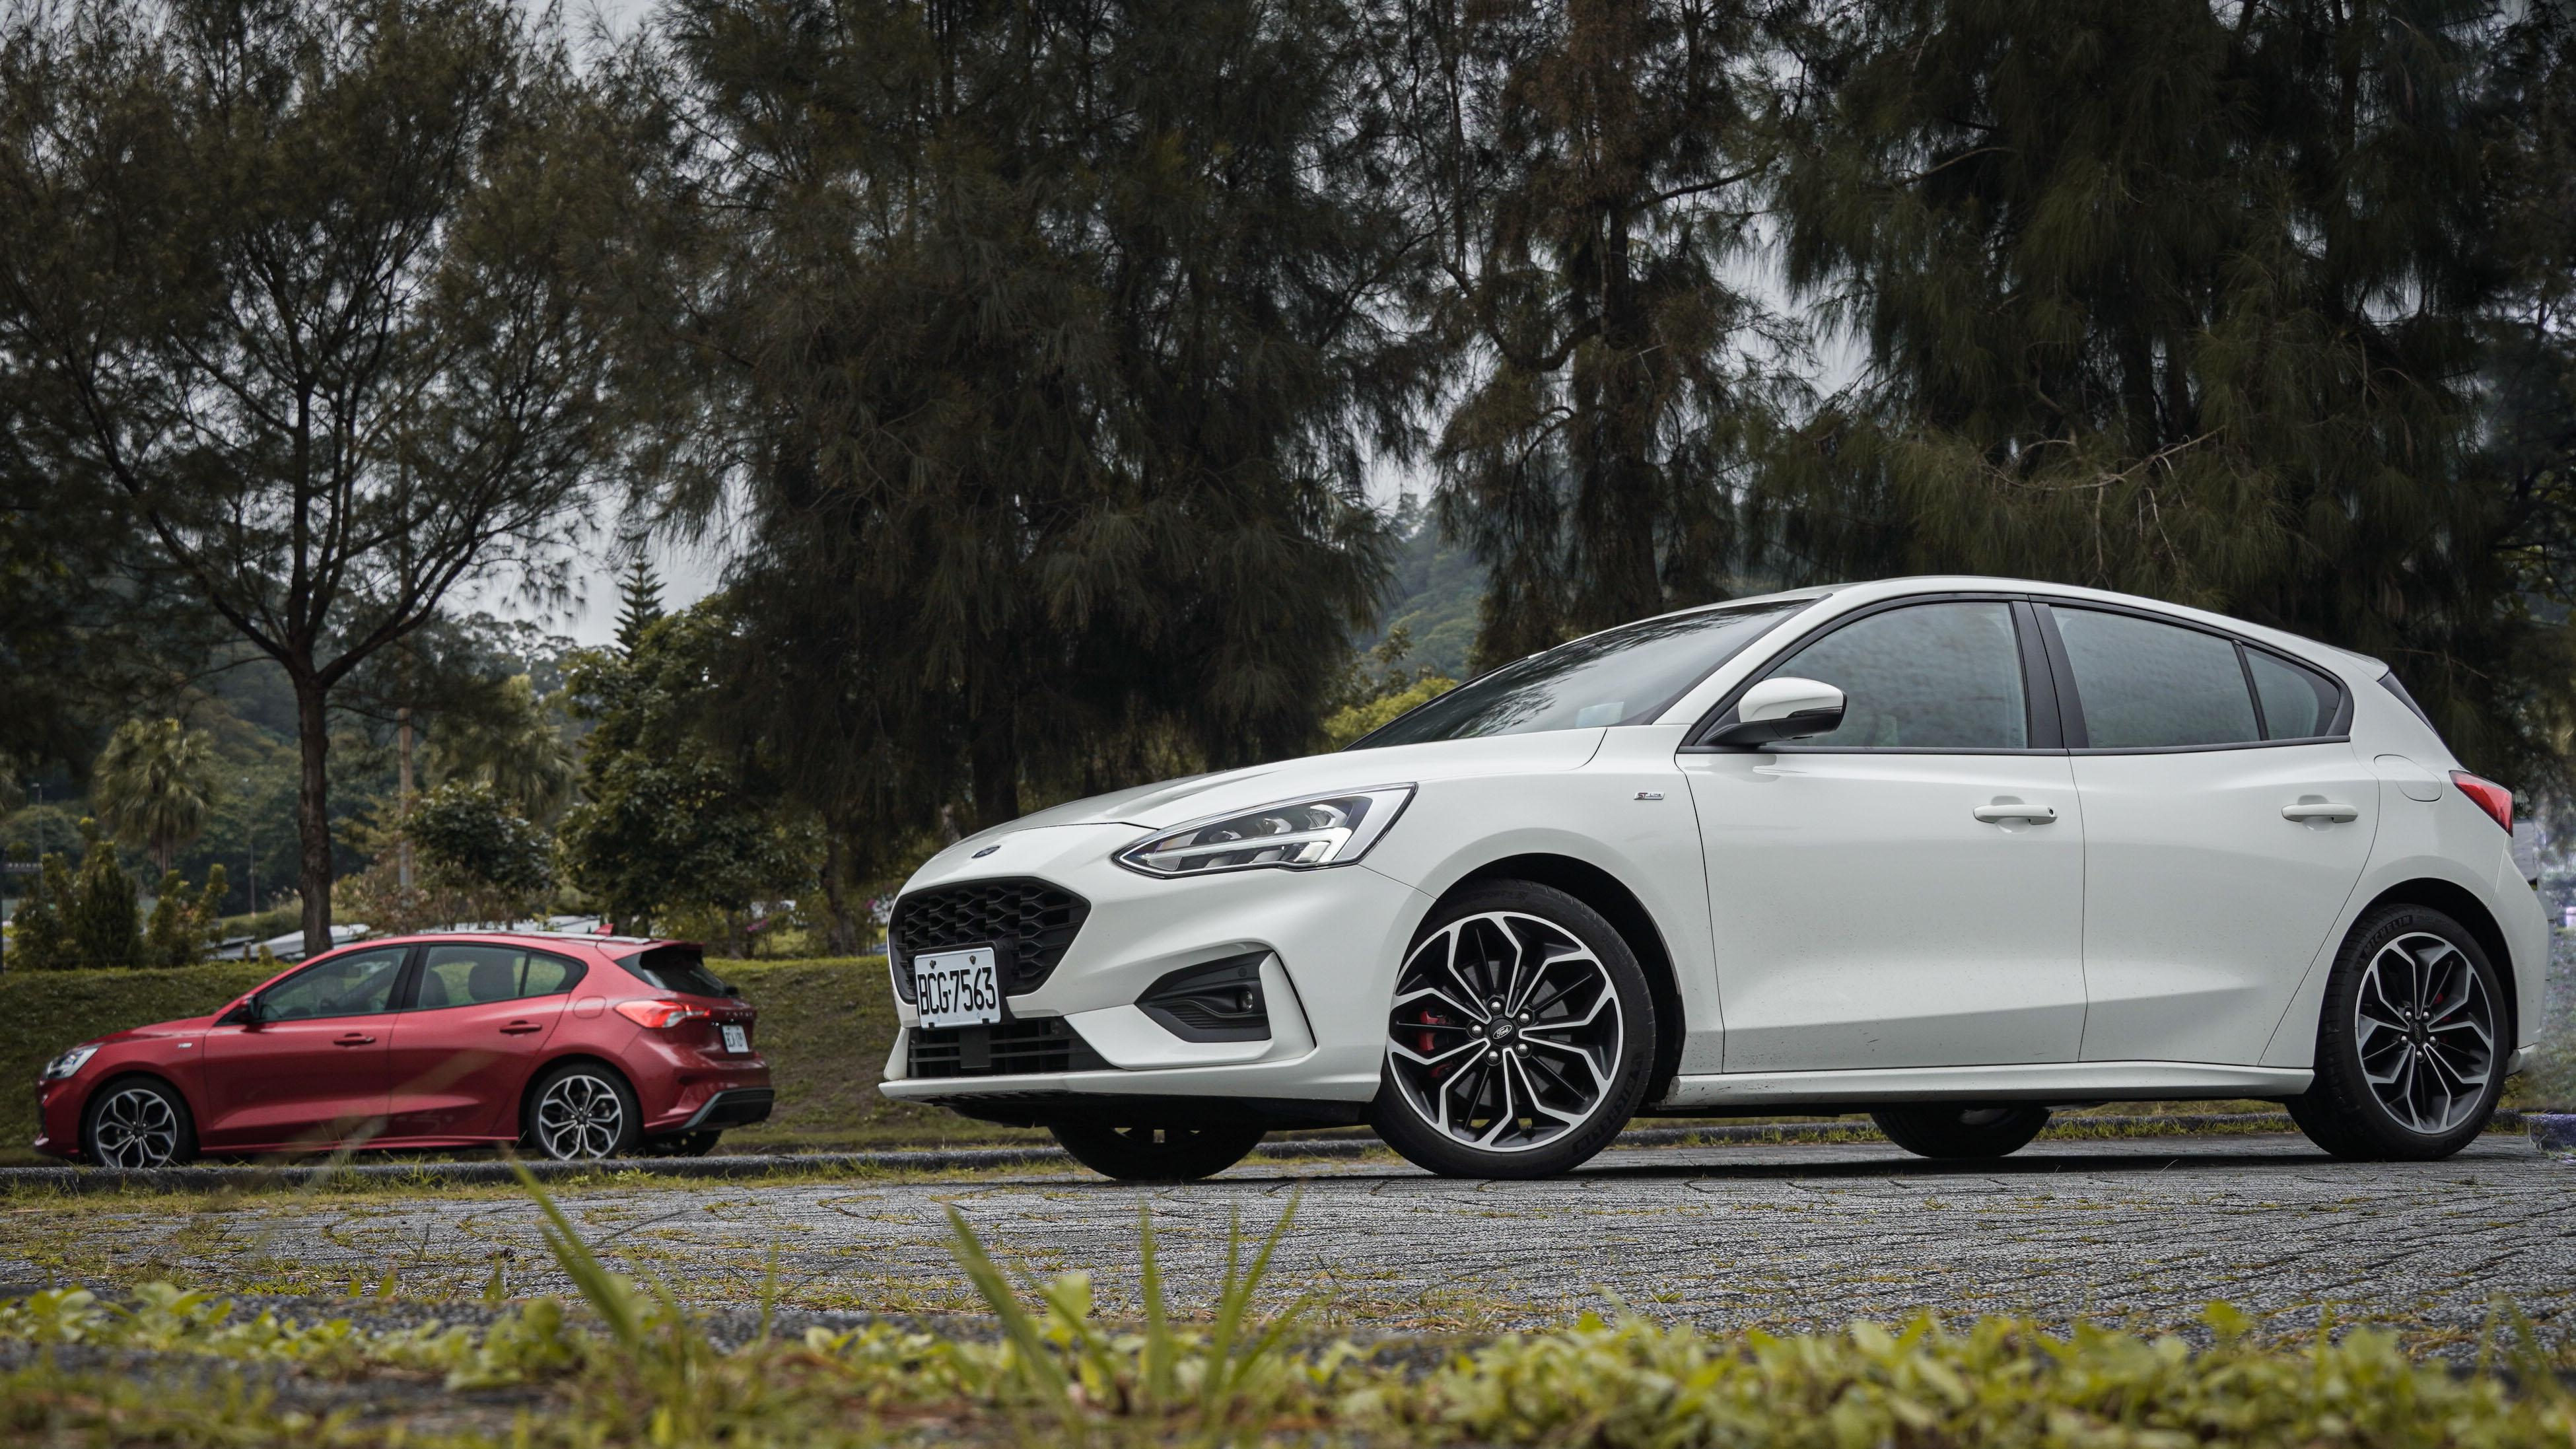 Ford Focus ST-Line Lommel 是賽道特化版,還是舒適升級版?